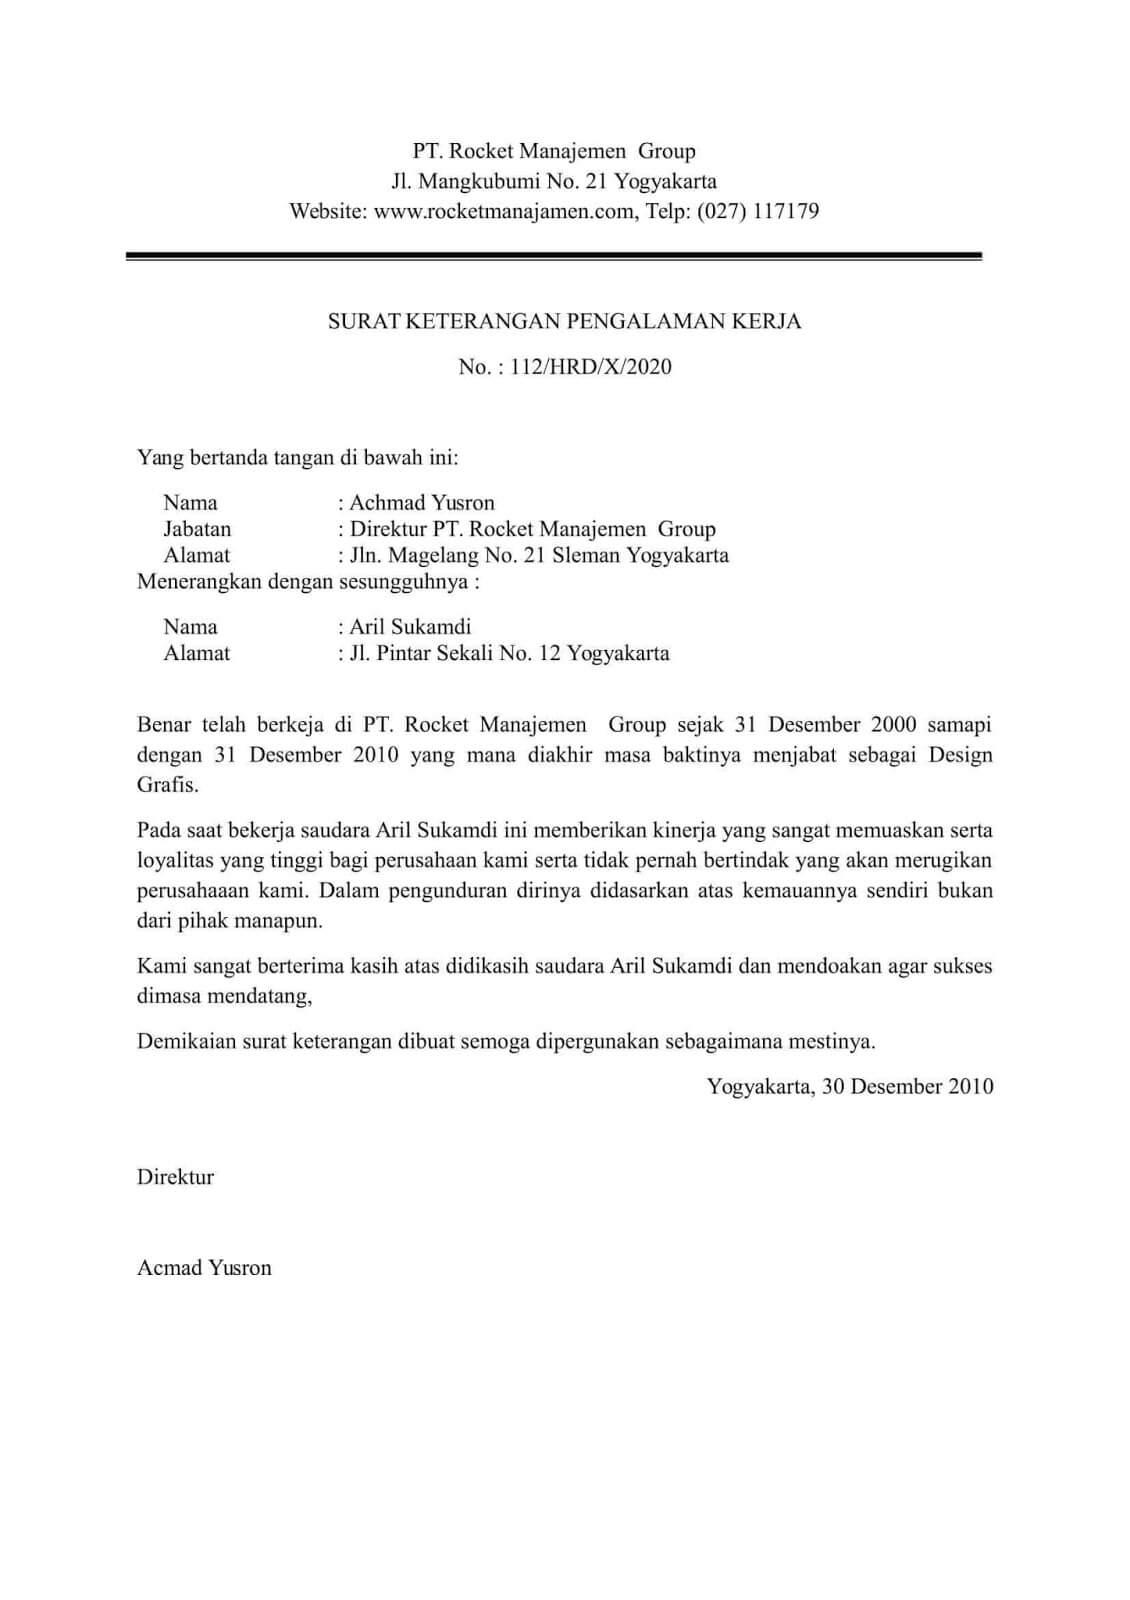 8 Contoh Surat Keterangan Kerja Terlengkap Untuk Berbagai Keperluan Contoh Surat